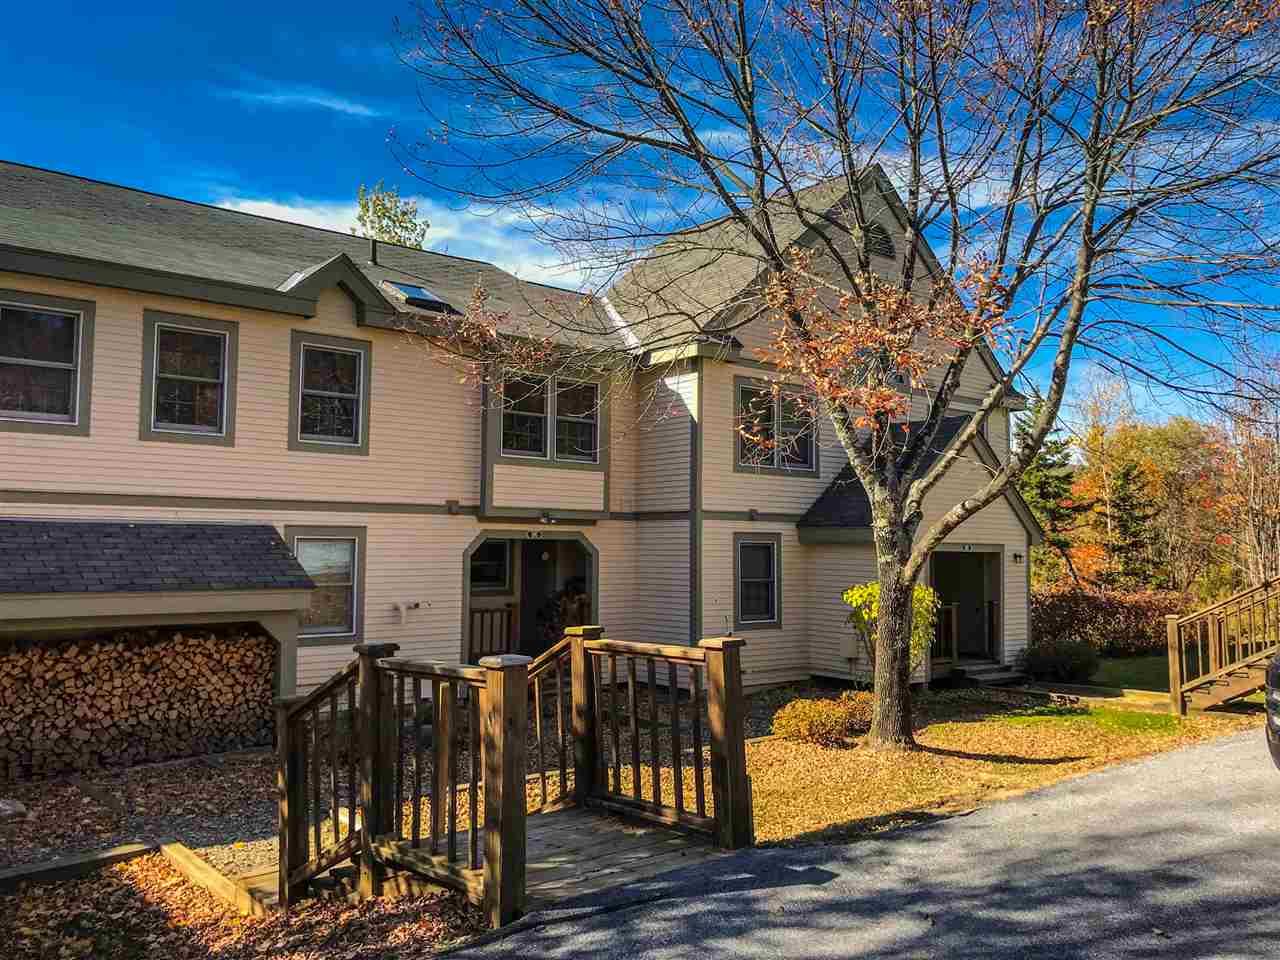 Mount-Snow-Real-Estate-4617772-16